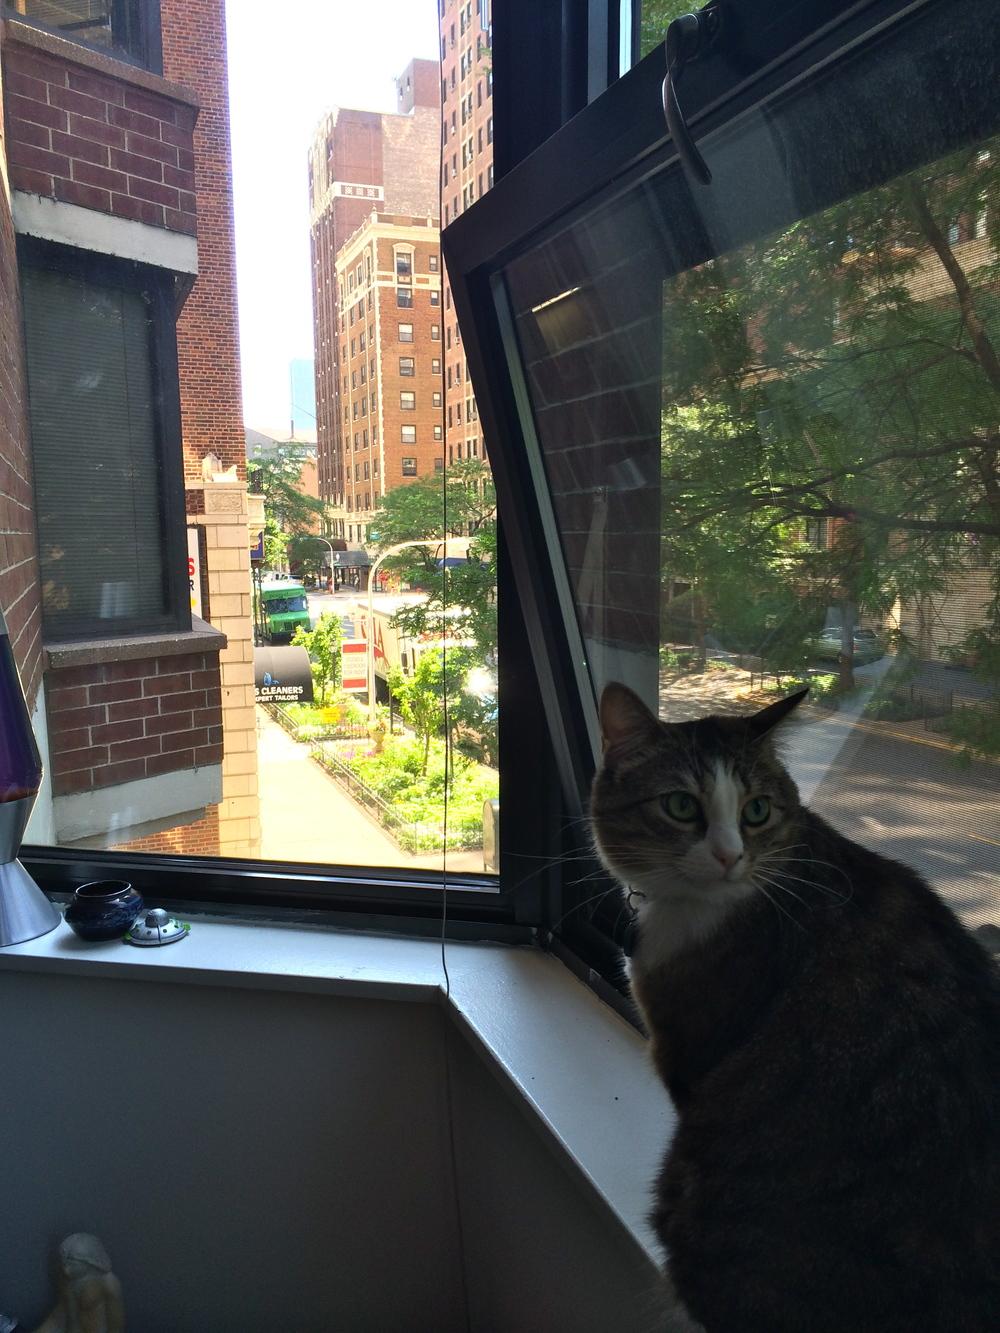 Gigi enjoying the bay window and nice day